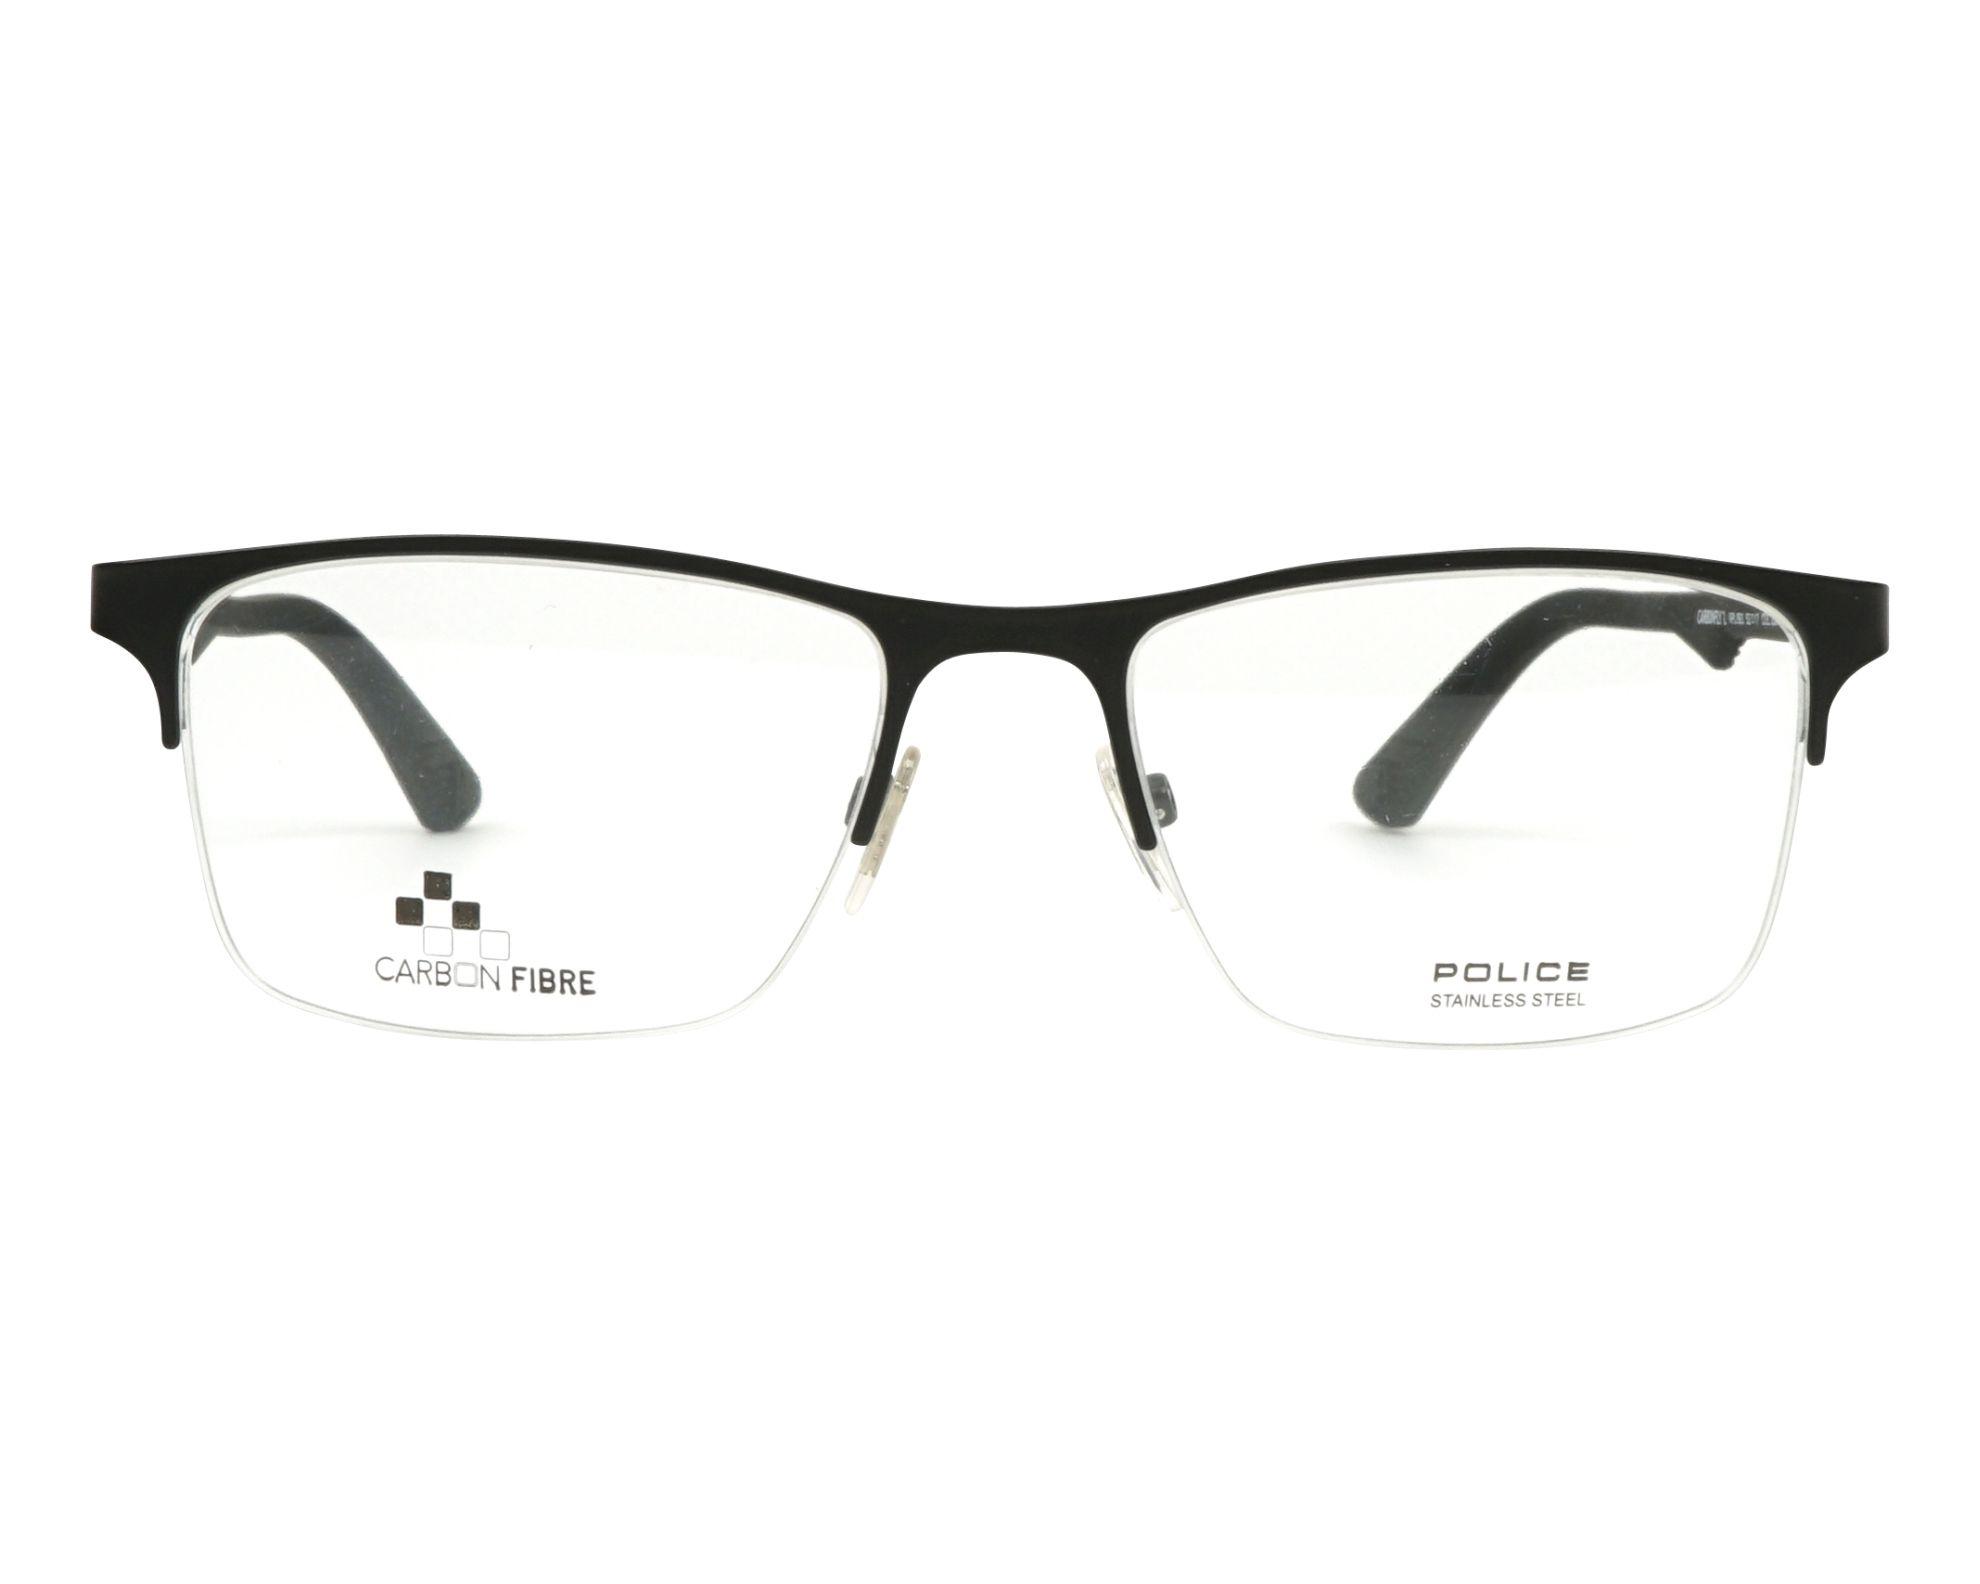 Occhiali da Vista Police VPL693 0531 mgKwwcwWGR